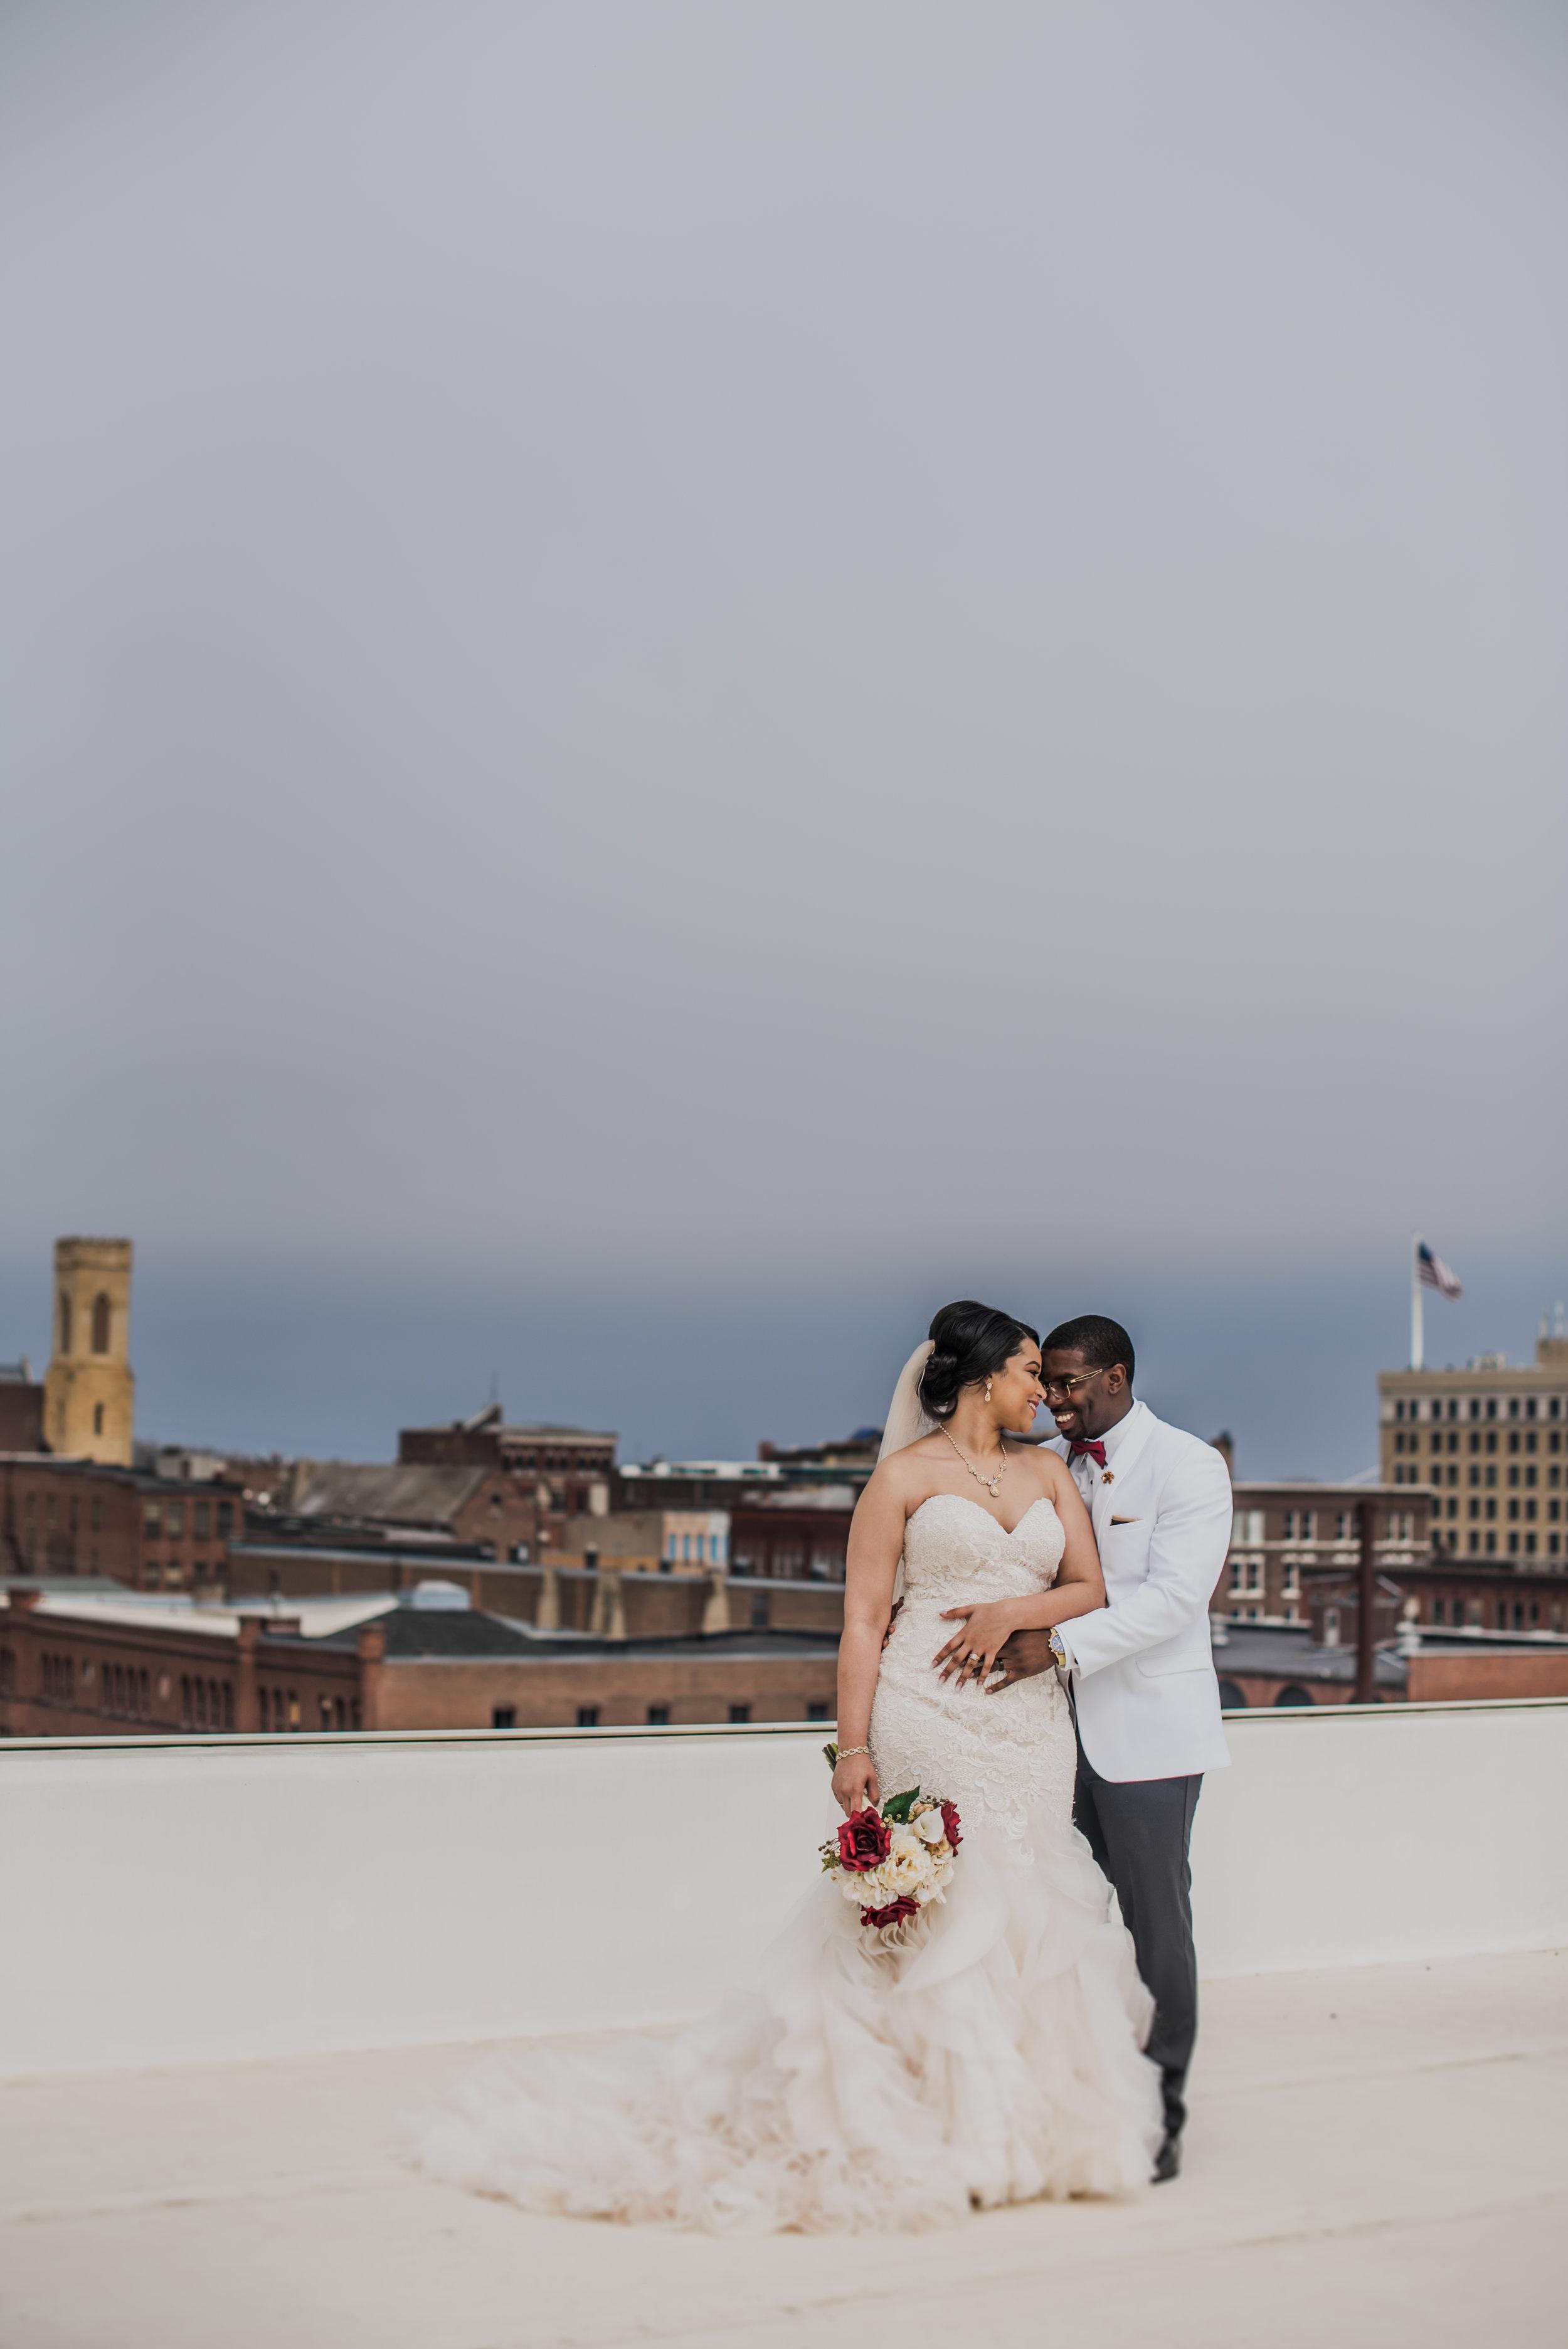 Burlington Iowa Wedding Midwest Photographer Melissa Cervantes _ Chantelle and Isaiah 291s.jpg